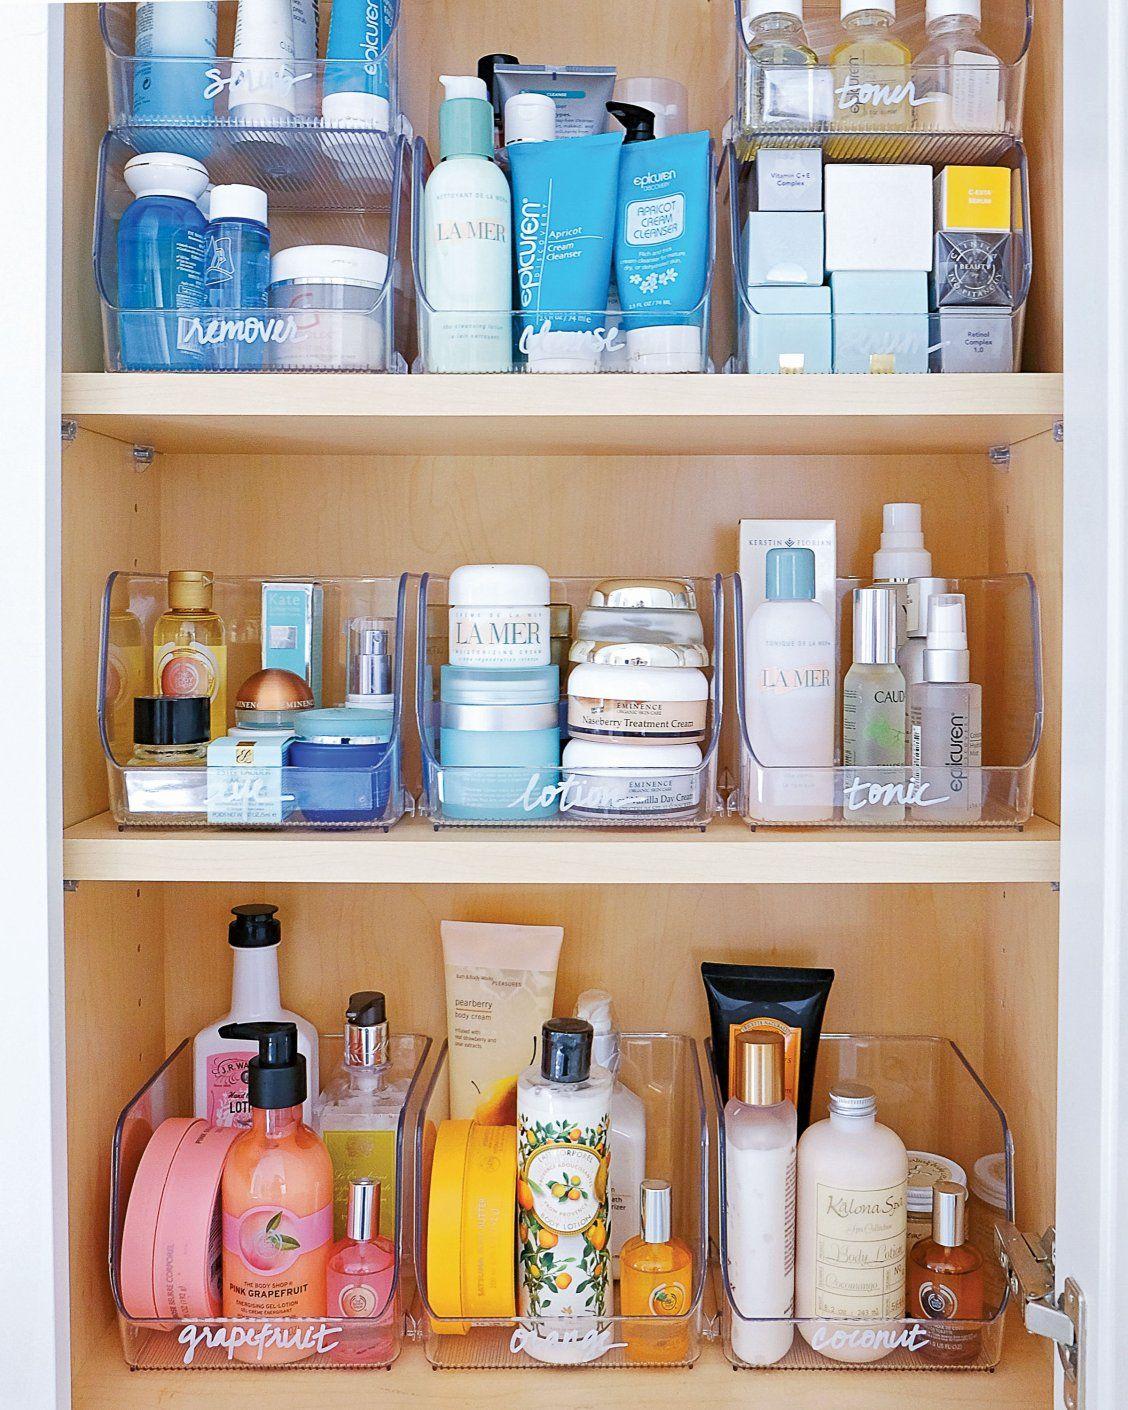 The Home Edit By Clea Shearer Joanna Teplin 9780525572640 Penguinrandomhouse Com Books In 2020 Bathroom Organisation Bathroom Storage Organization Organization Bedroom